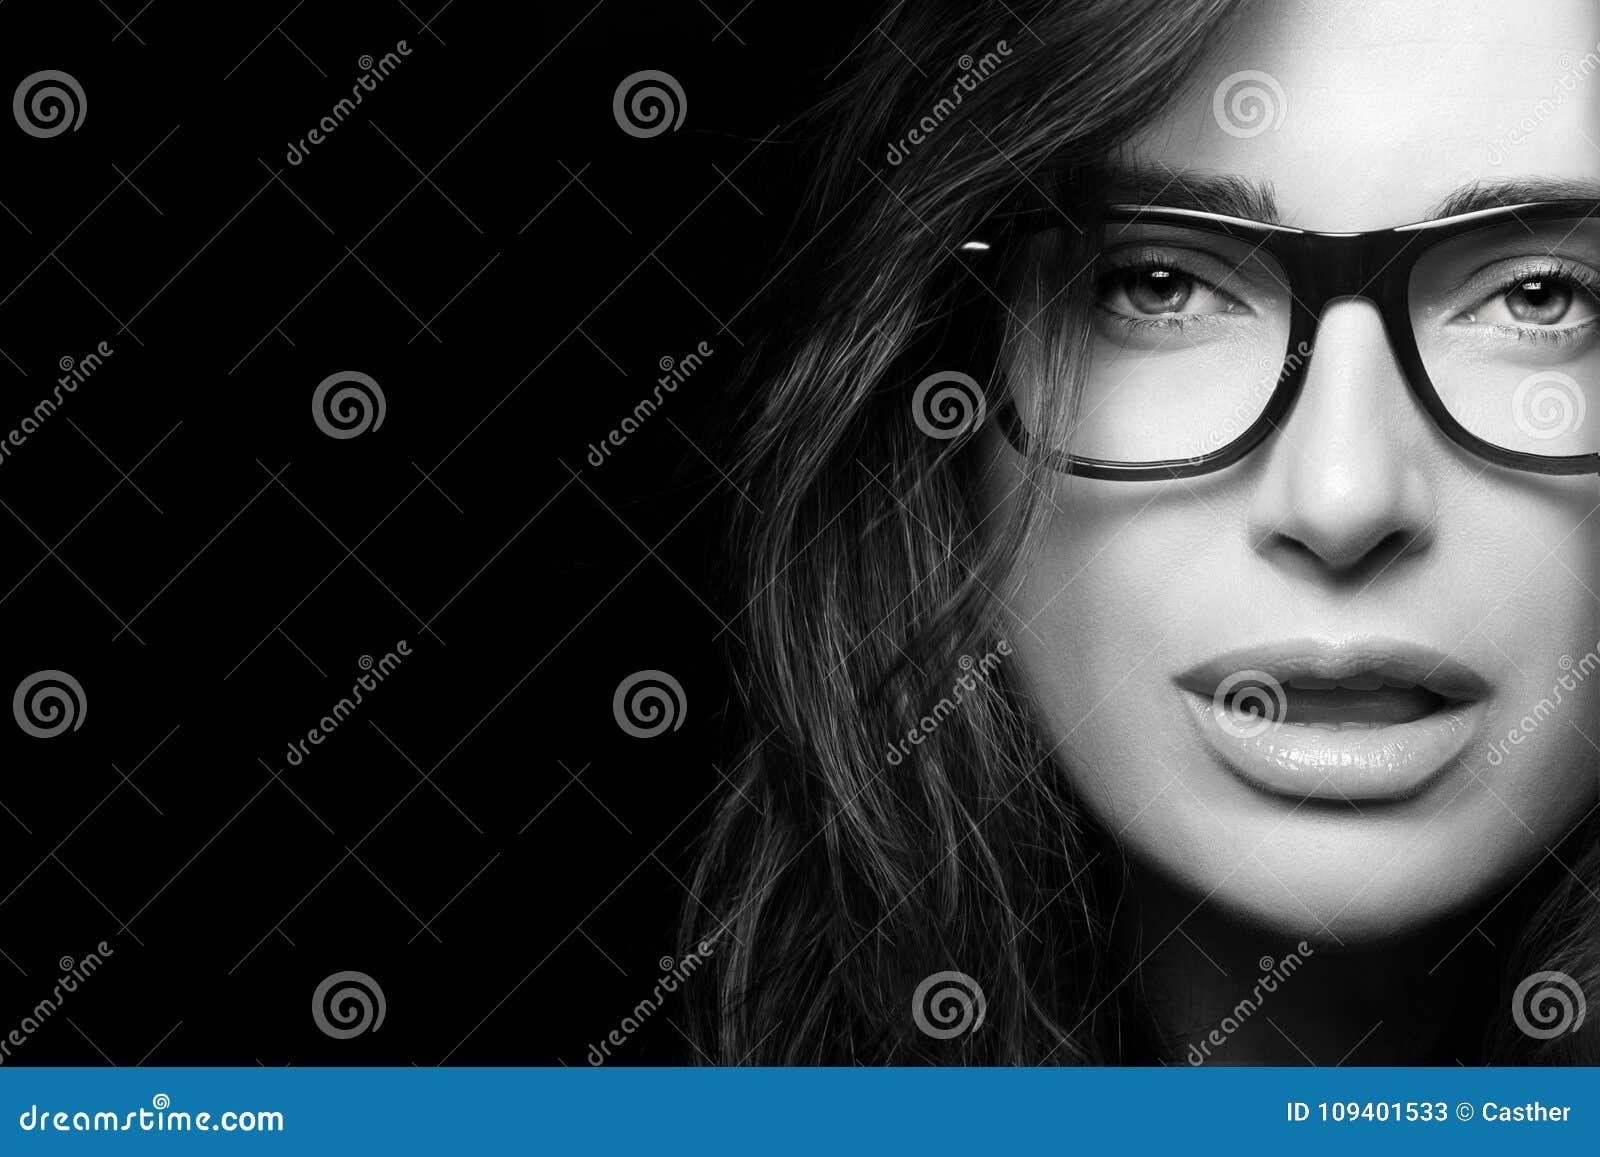 12c2070f131 Cool Trendy Eyewear. Beautiful Young Woman In Glasses. Stock Image ...